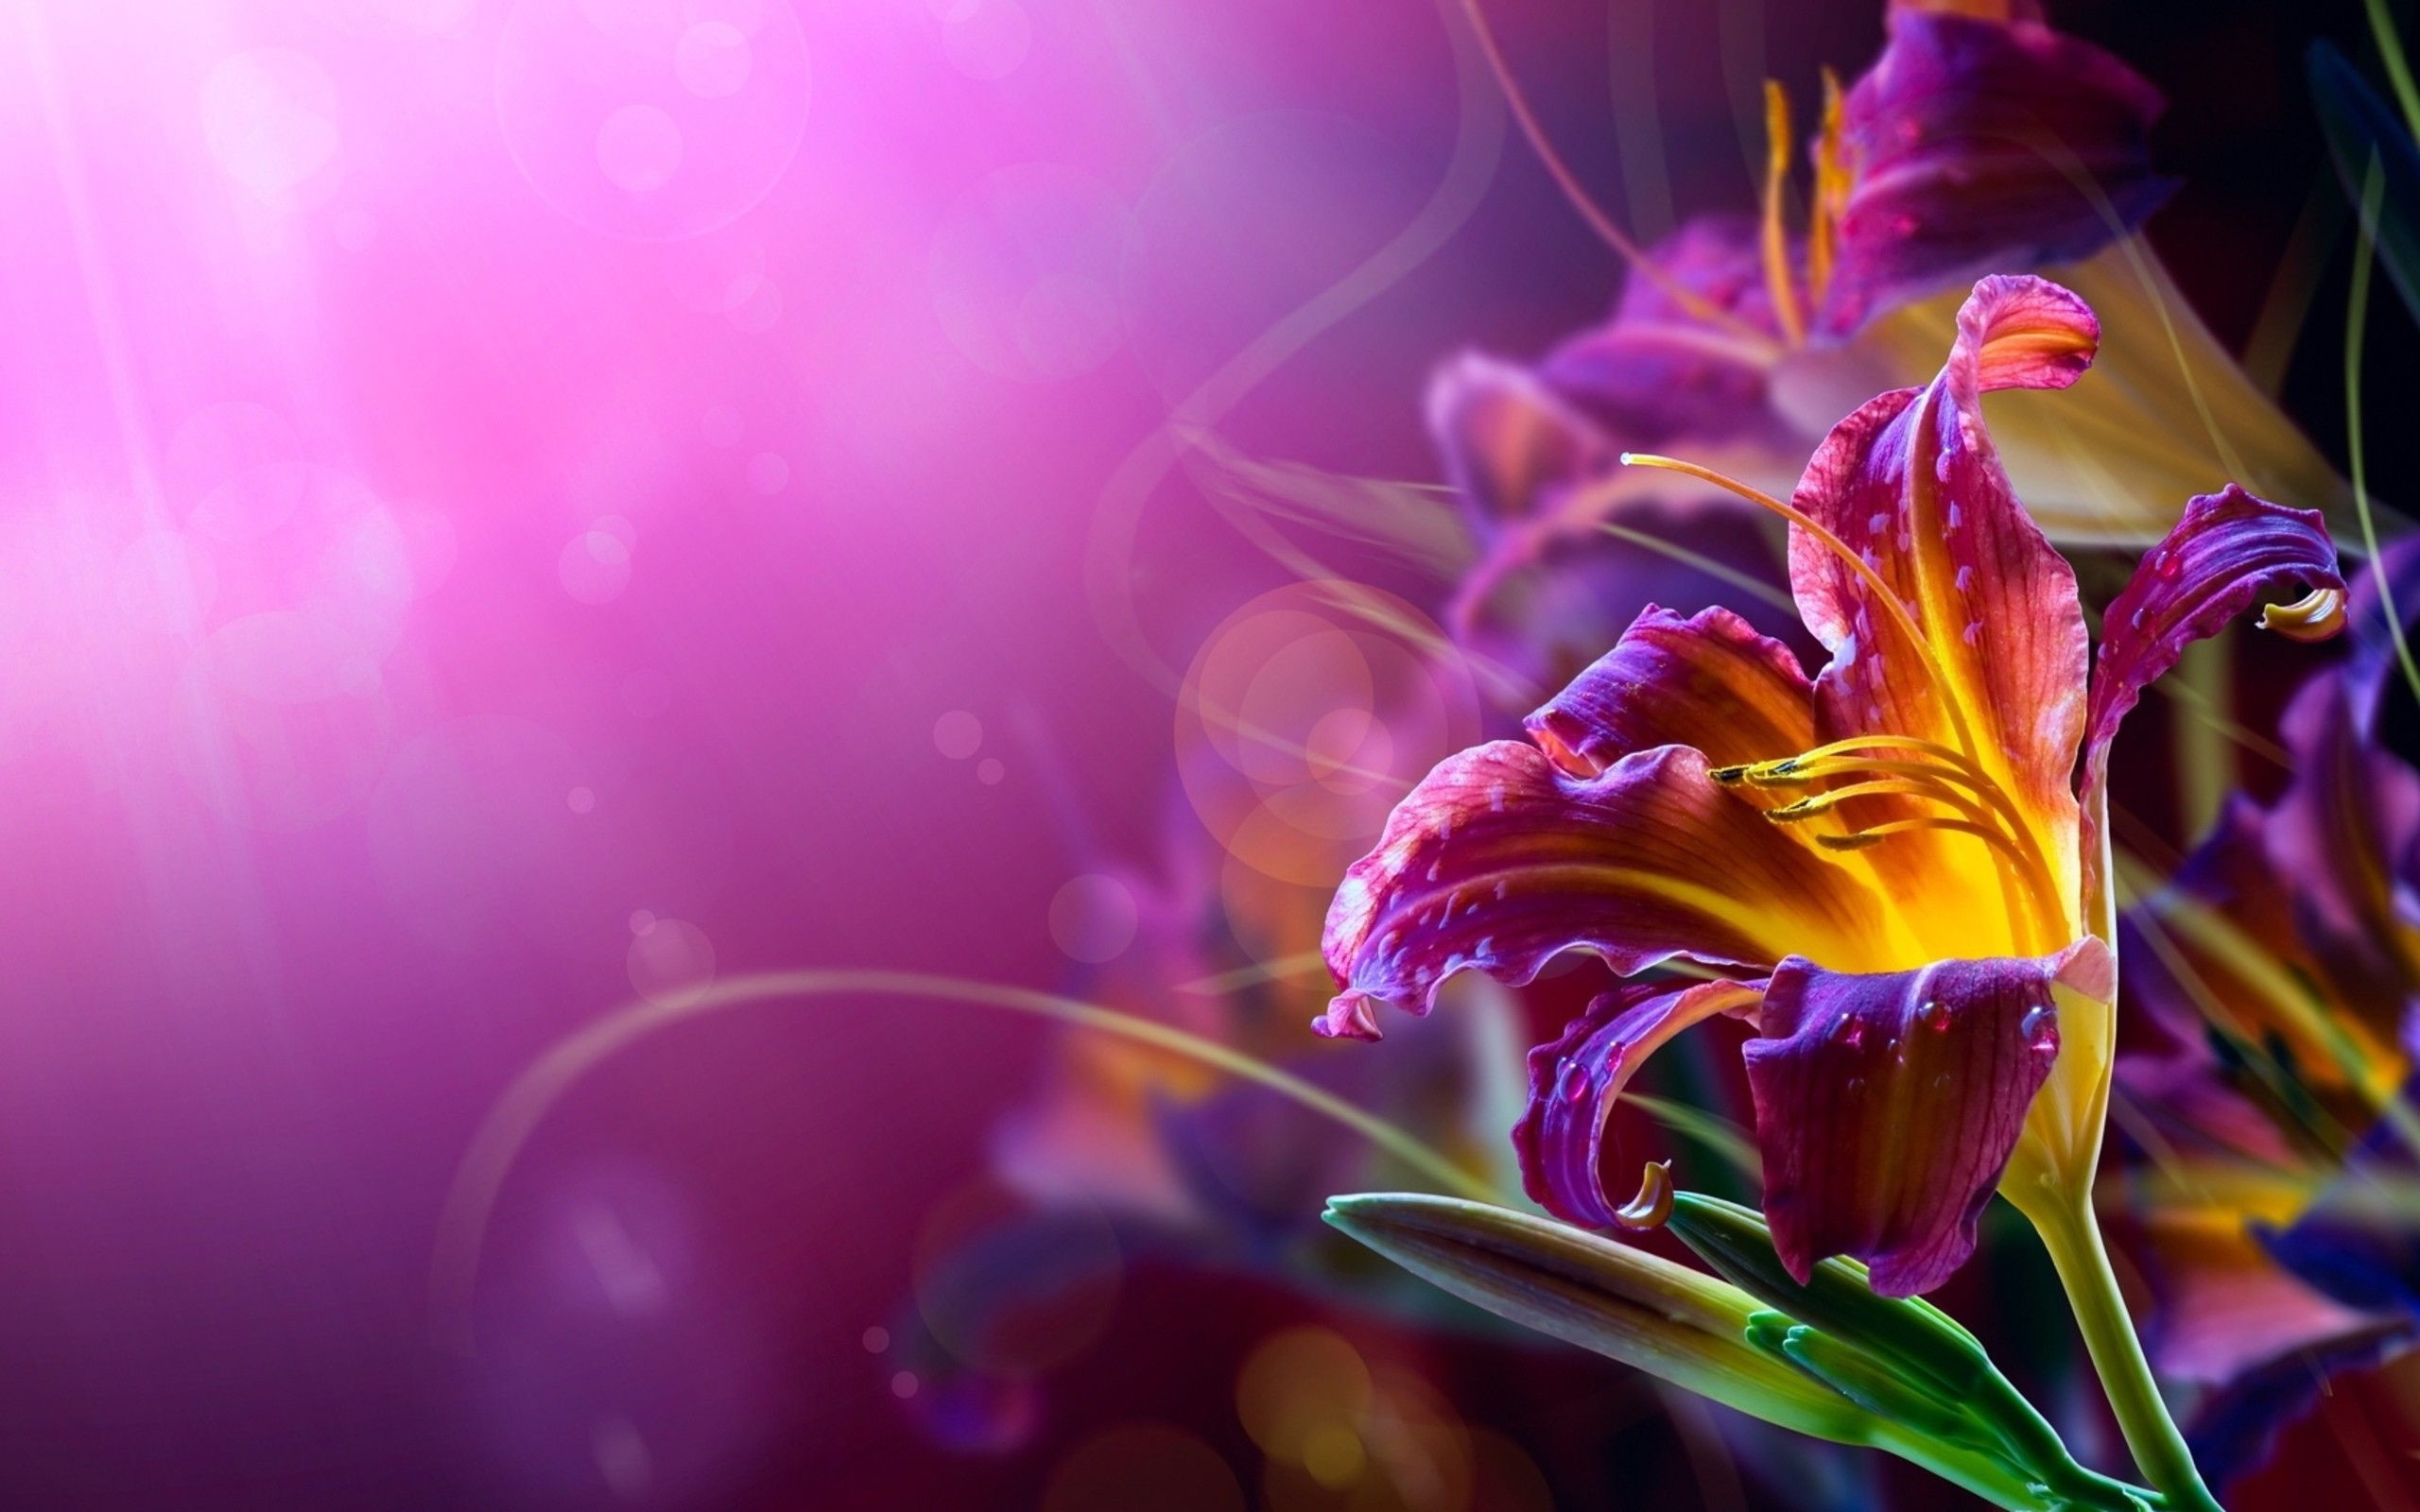 Res: 2560x1600, Violet, Flower, Widescreen, High, Resolution, Desktop, Background, Photos,  Download Wallpapers, Widescreen, Wallpaper Of Iphone, 2560×1600 Wallpaper HD